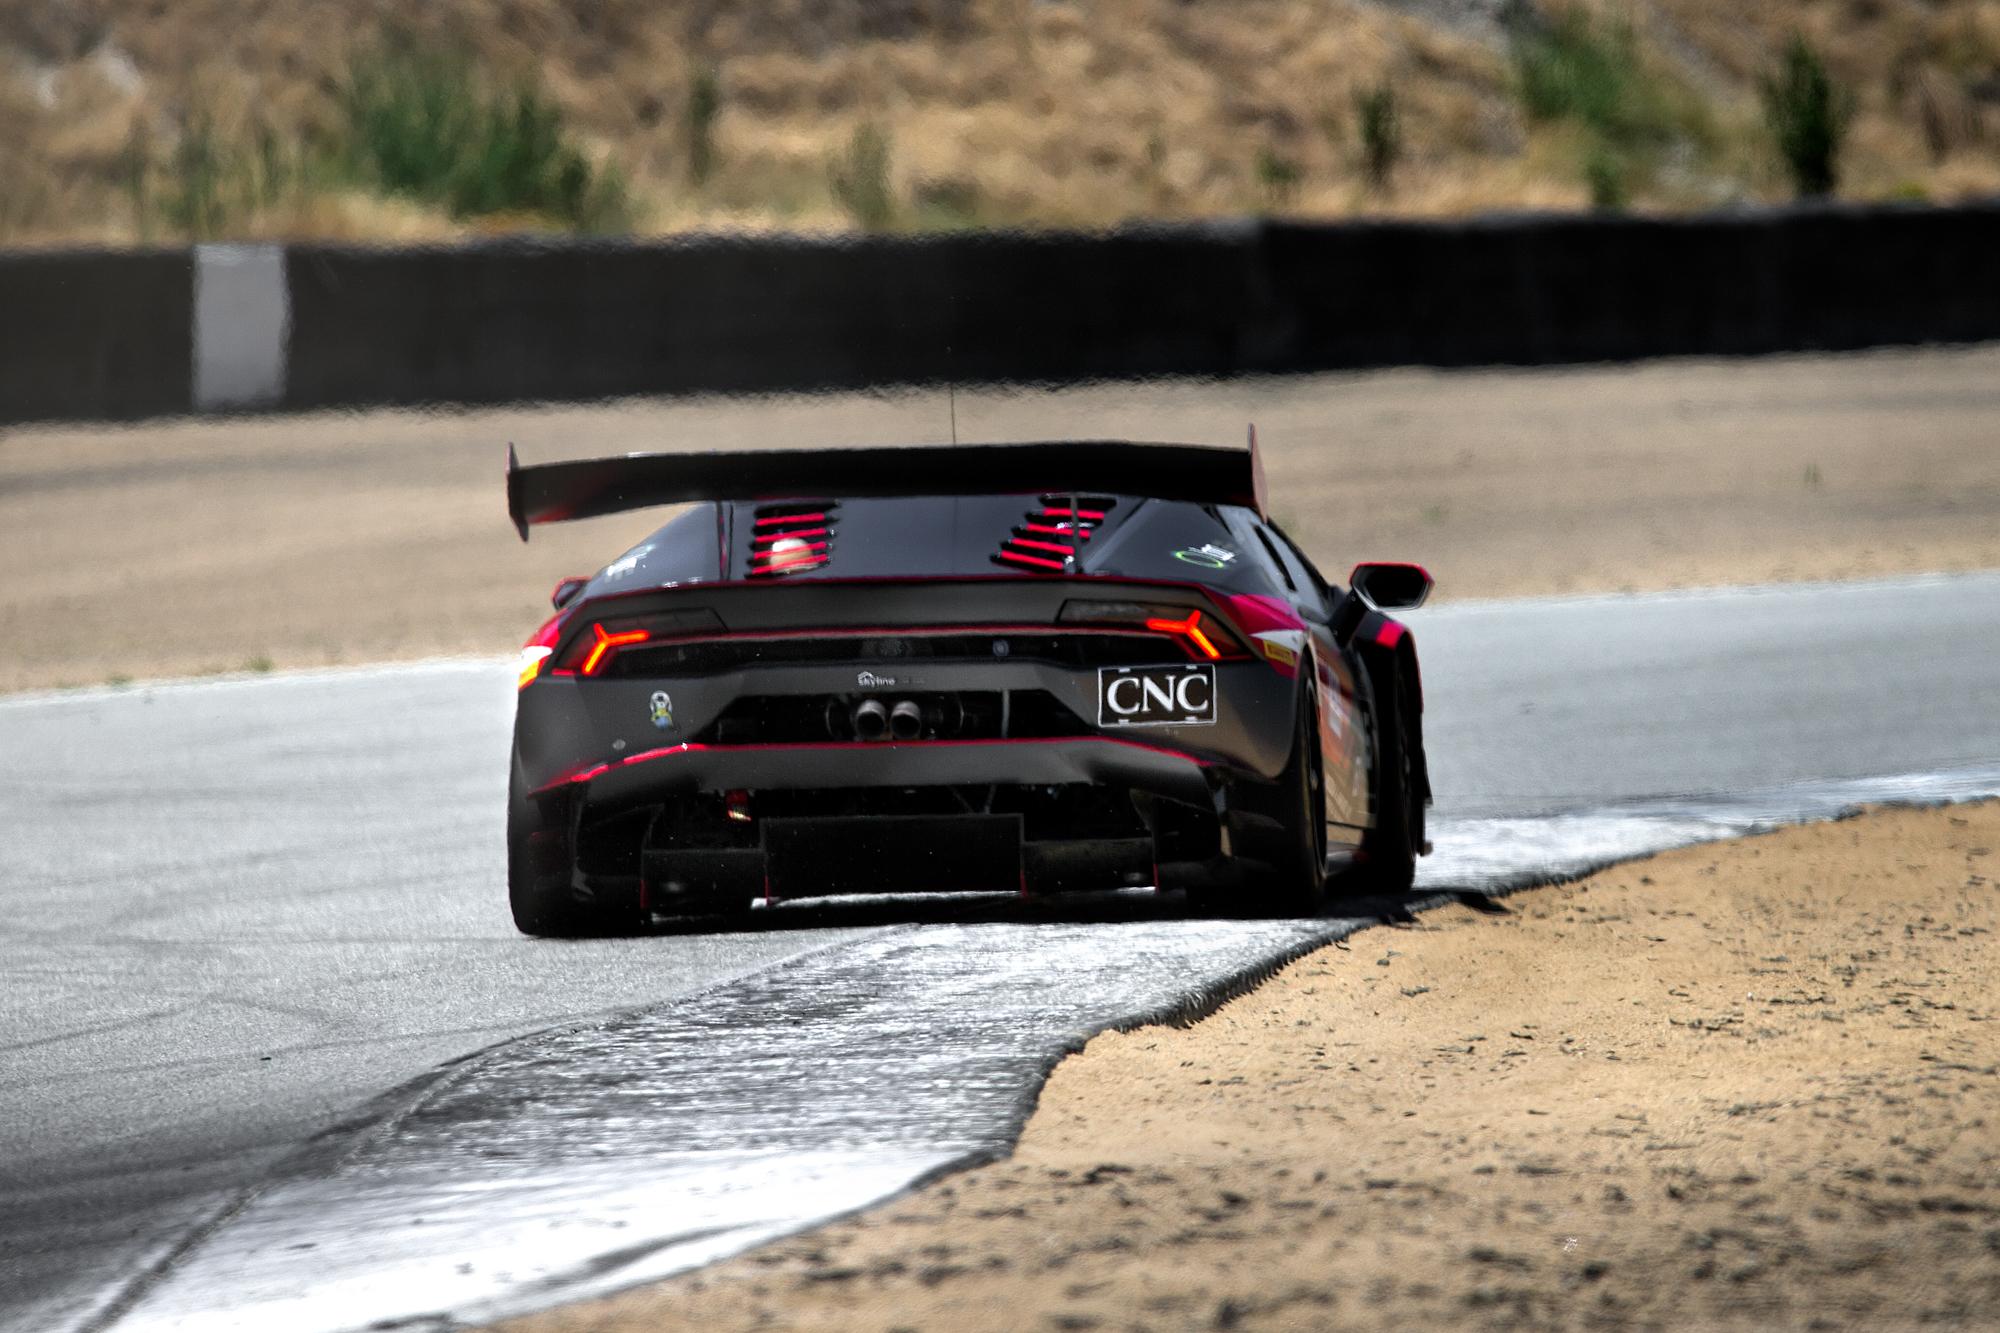 Steven-Racing-Laguna-20180602-96875.jpg